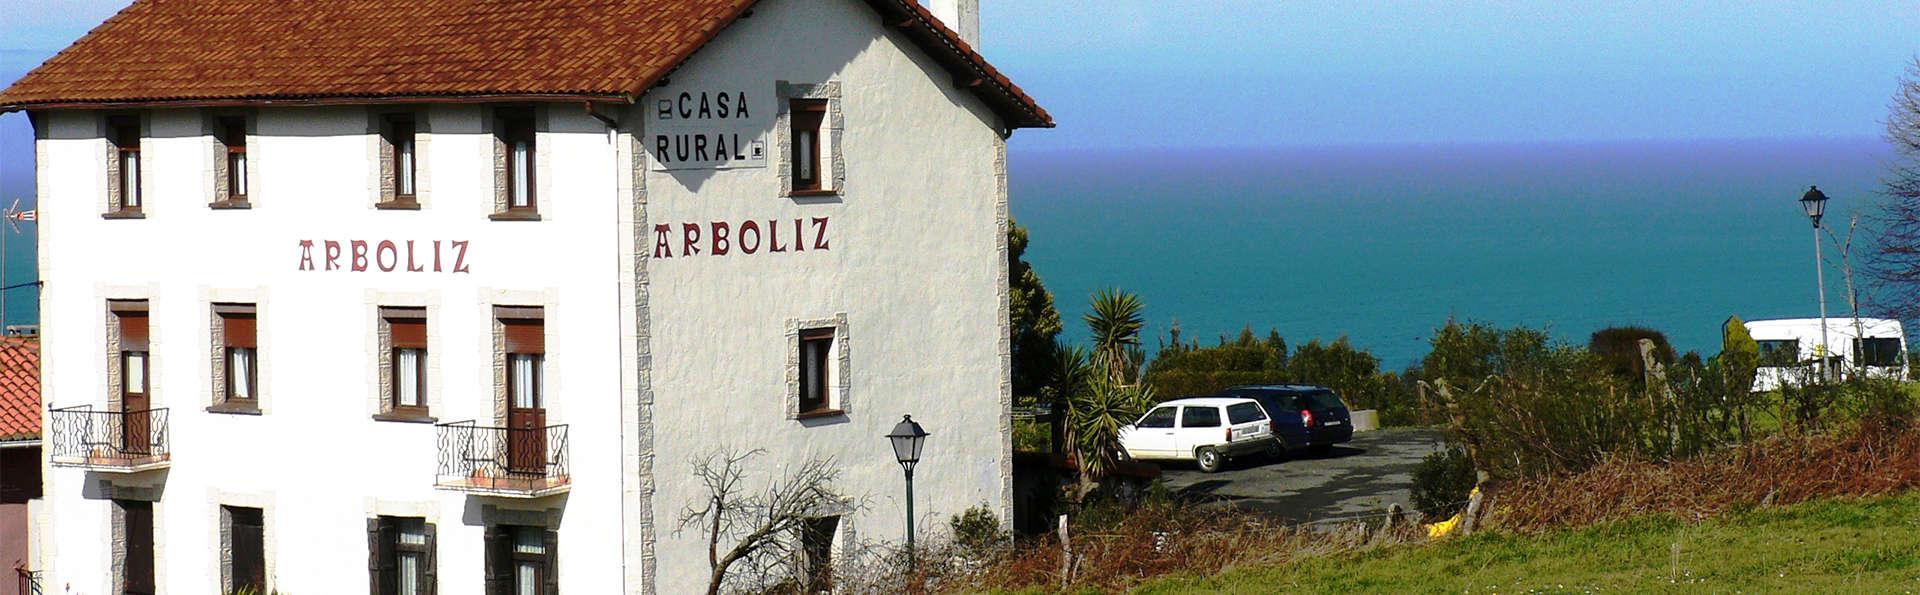 Casa Rural Arboliz - EDIT_Exterior.jpg